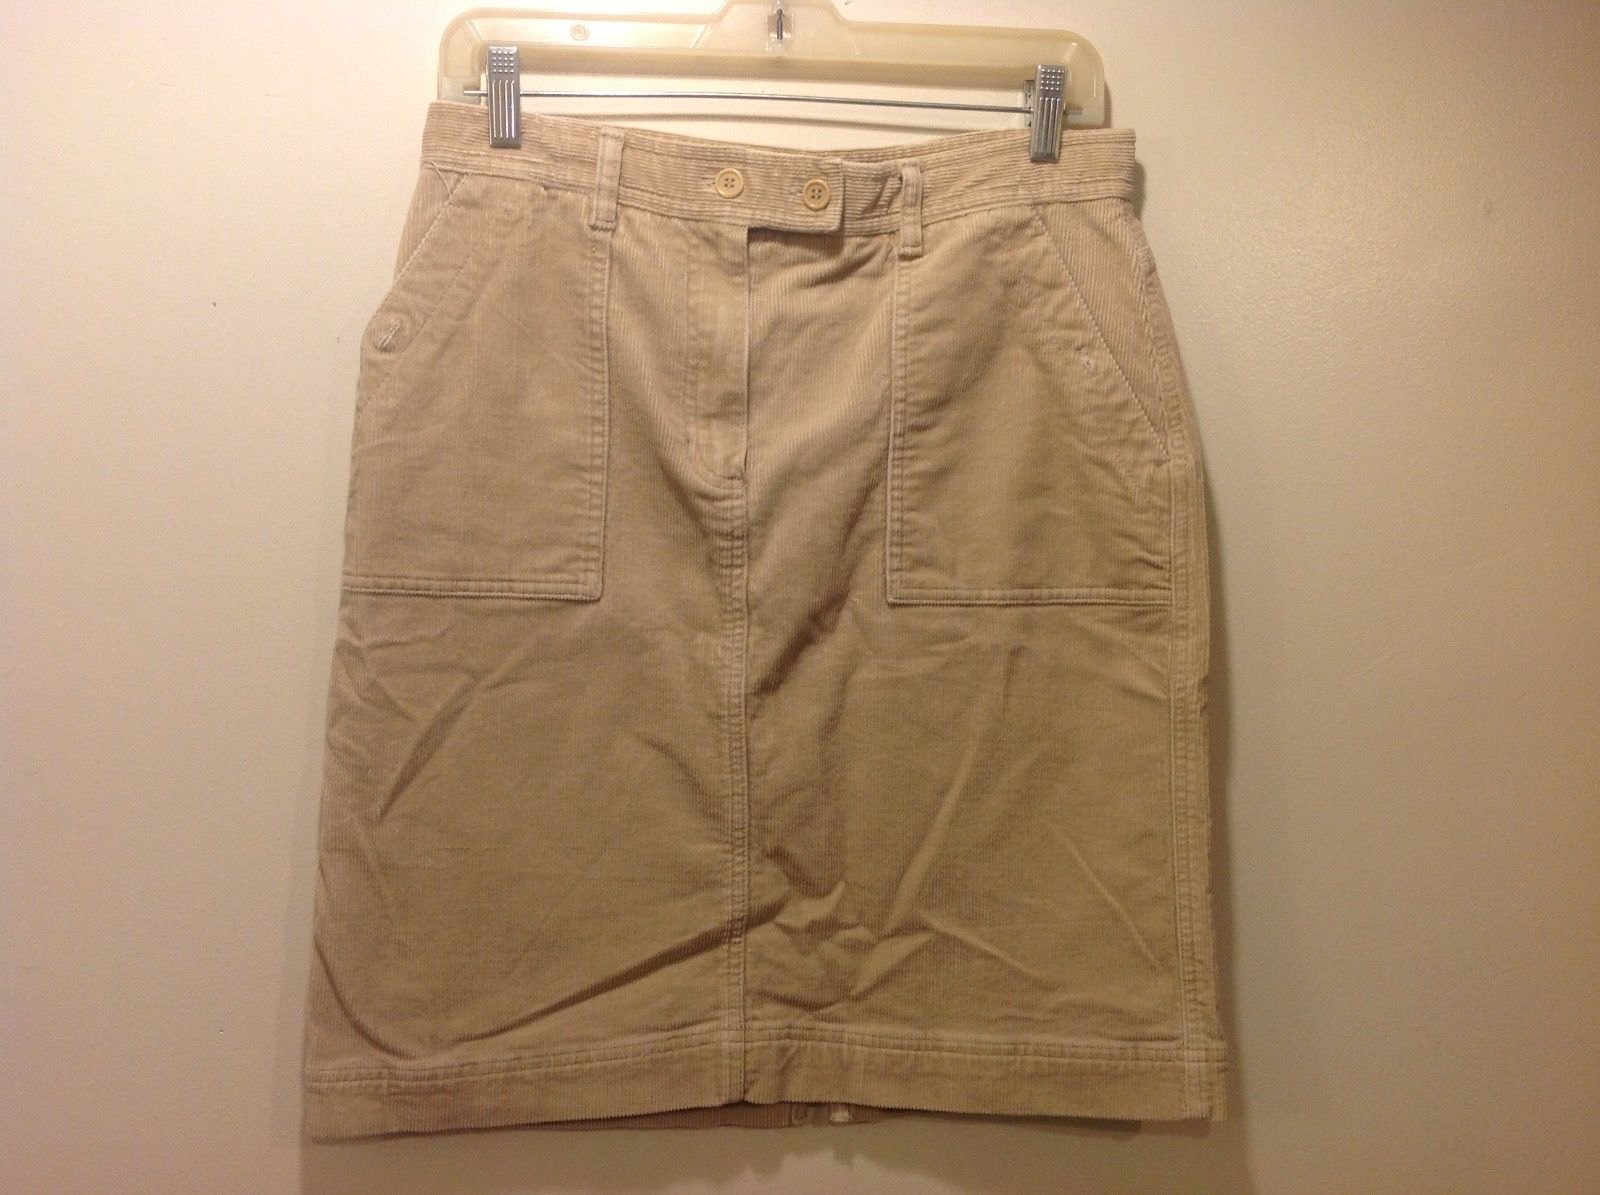 Jones New York Sport Tan Colored Corduroy Skirt Sz 6